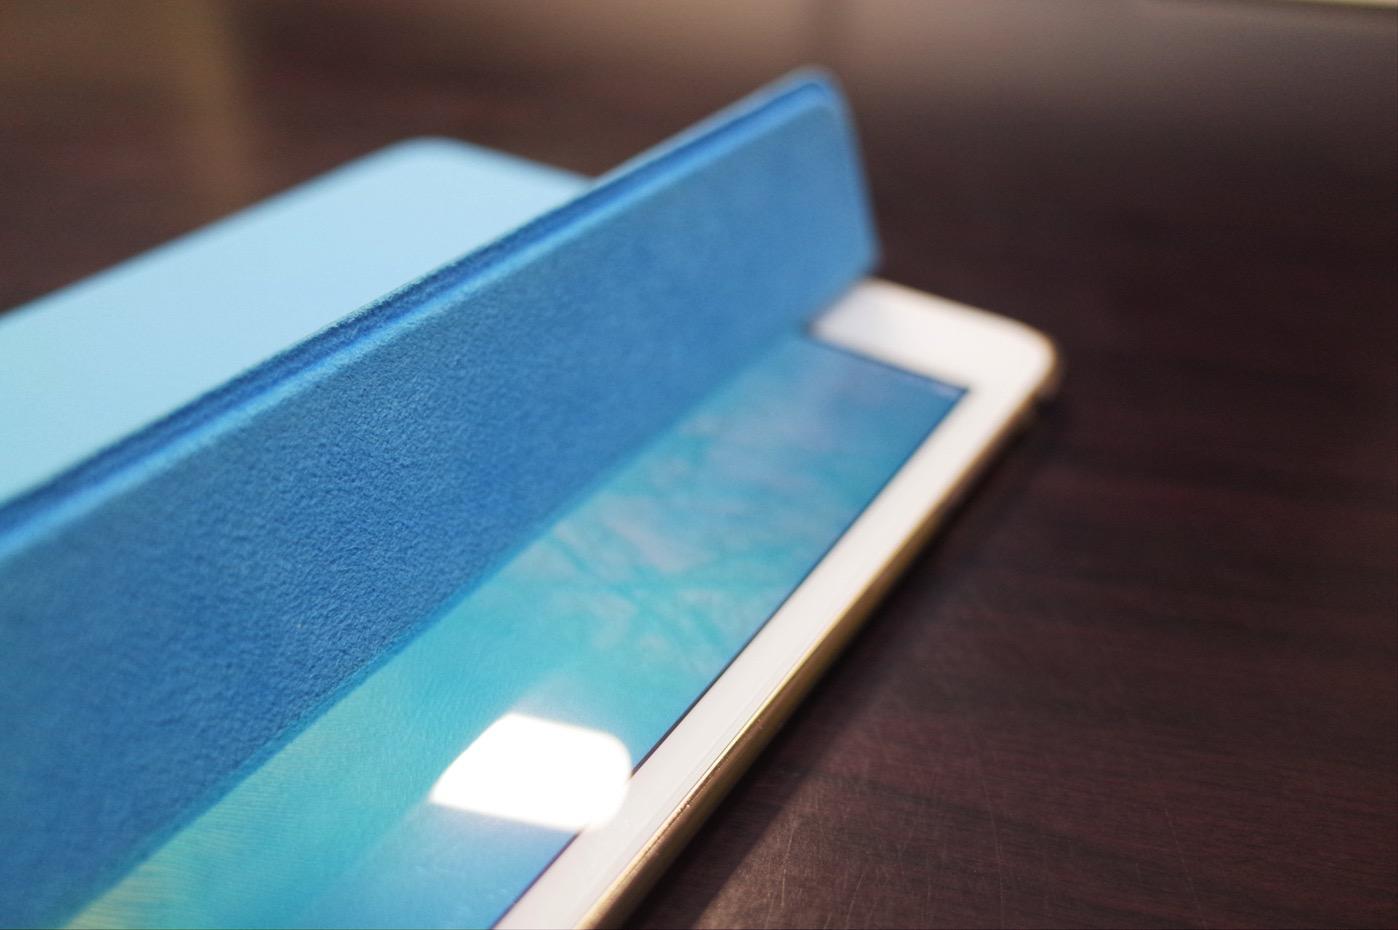 RoiCeil 液晶保護強化ガラスフィルム 硬度9H 超薄0.3mm 2.5D ラウンドエッジ加工-15